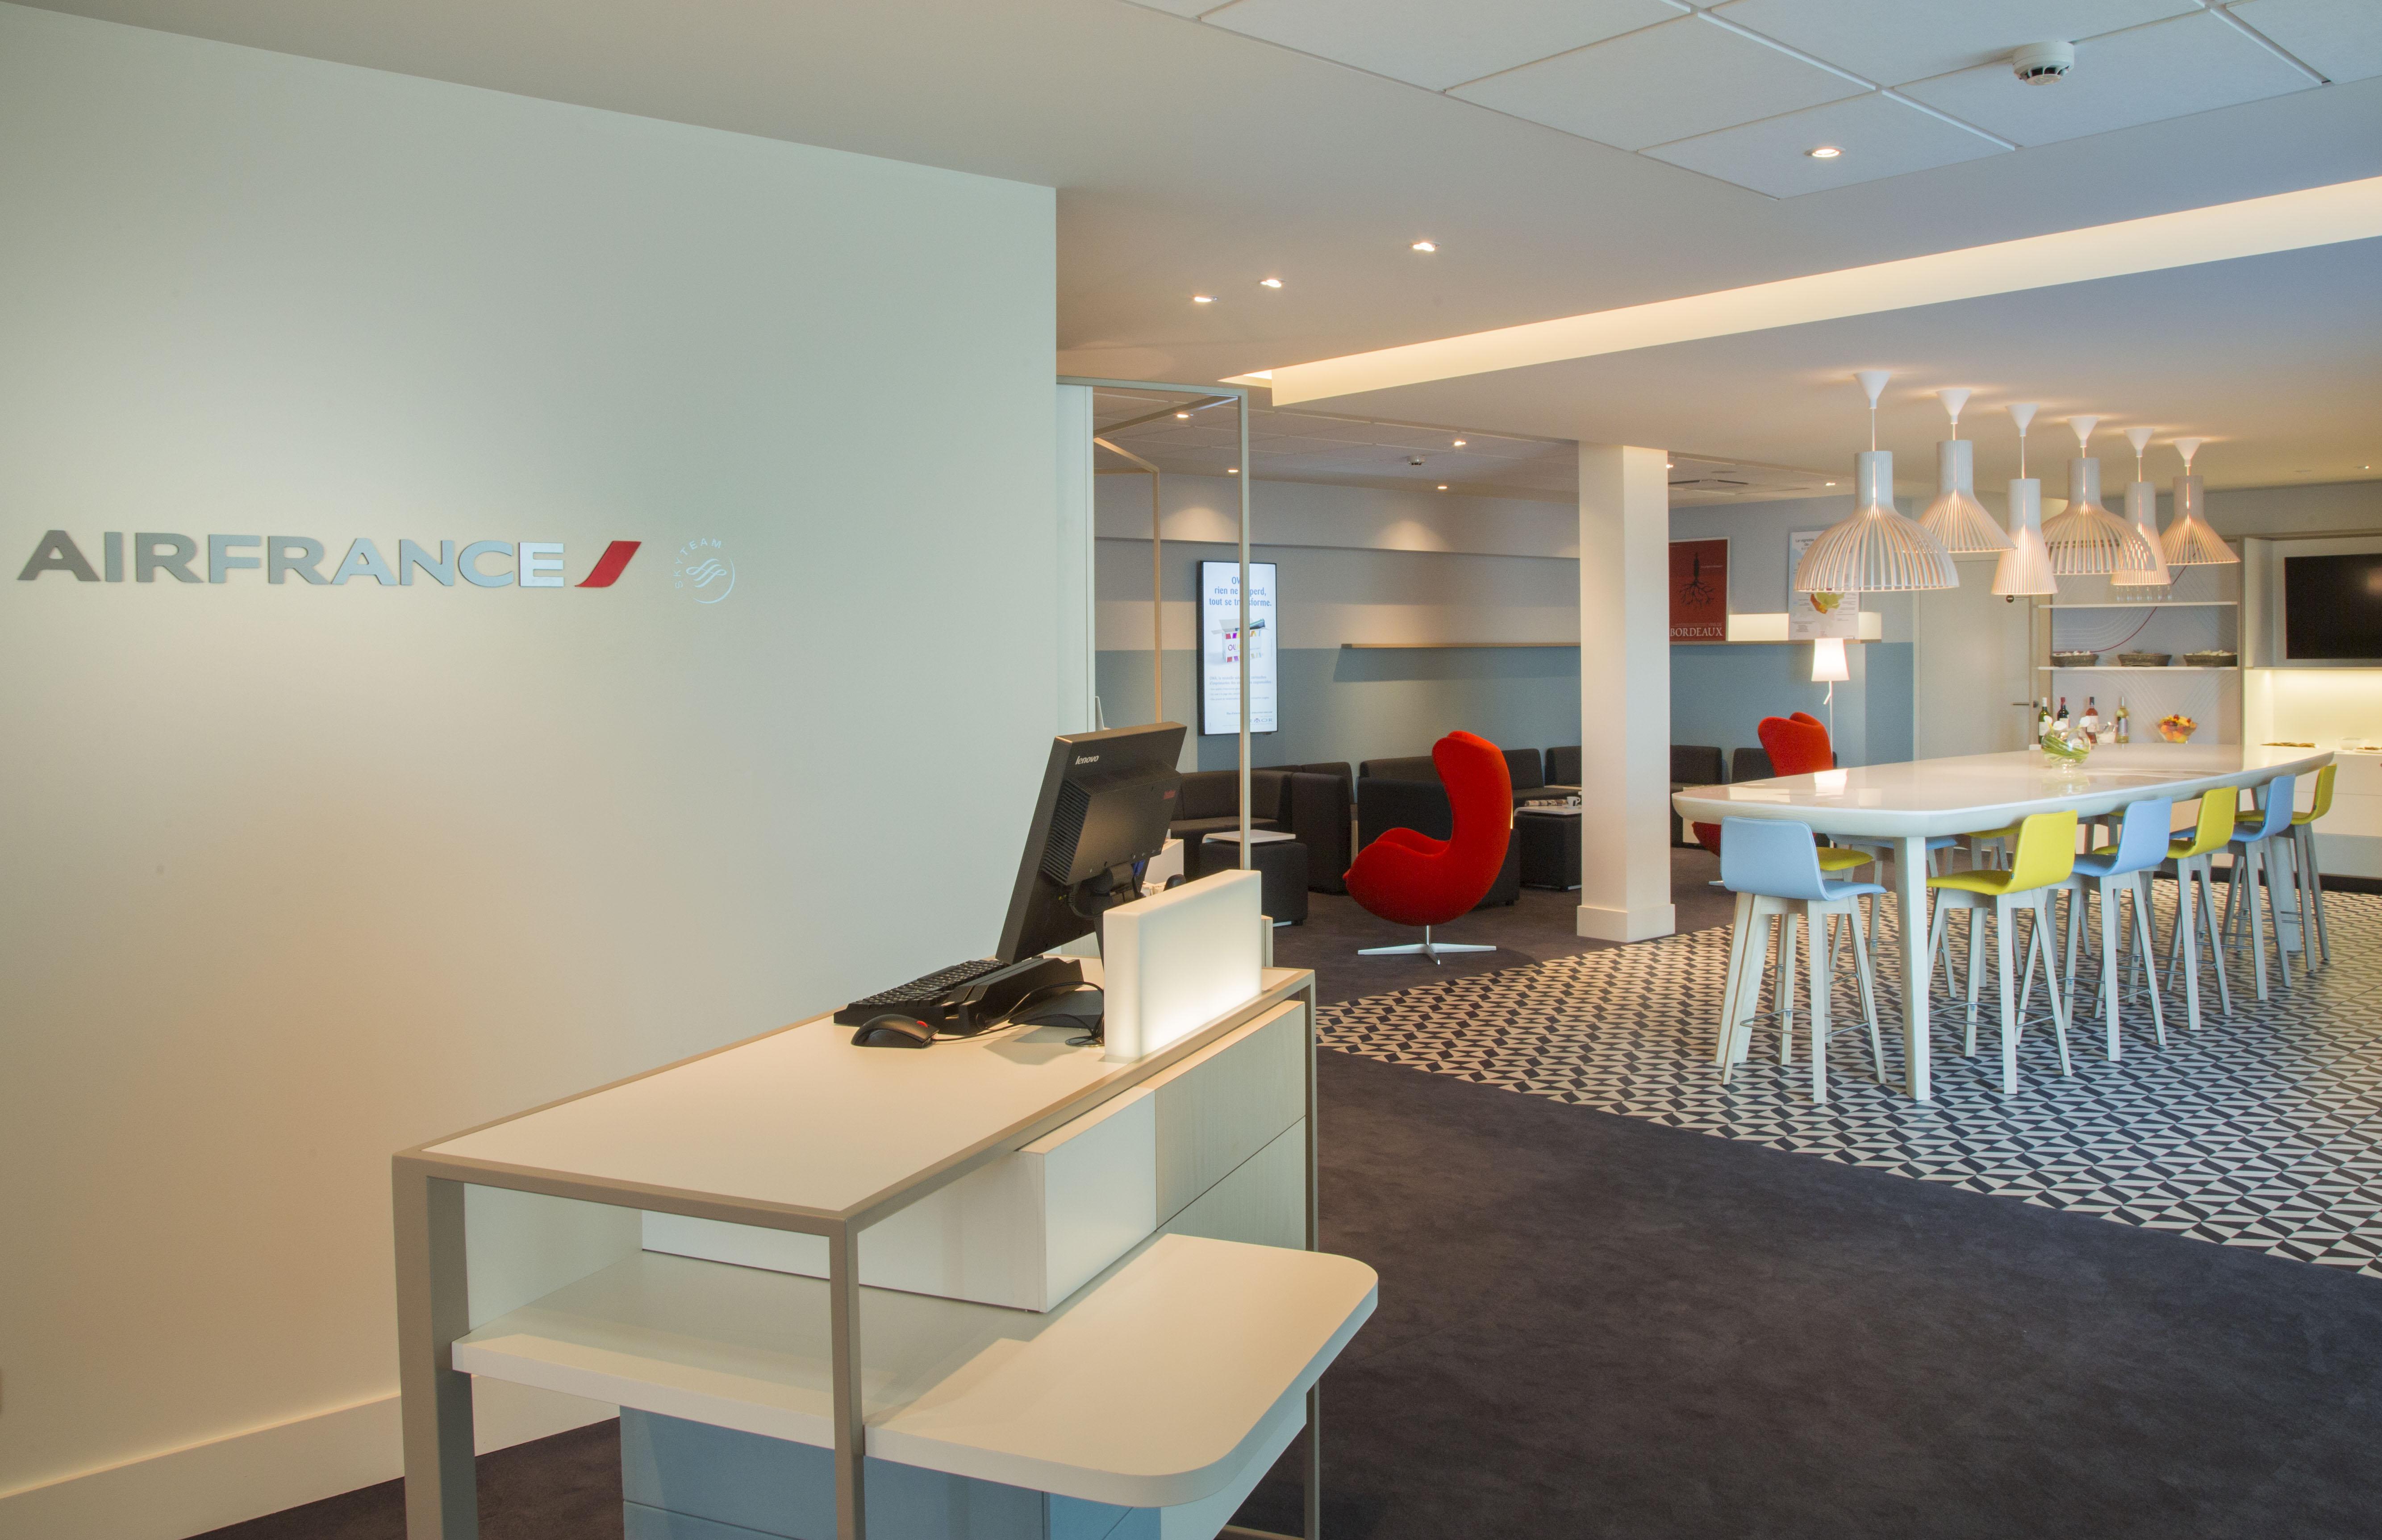 Air France Create Regional Designer Lounge In Bordeaux  TheDesignAir